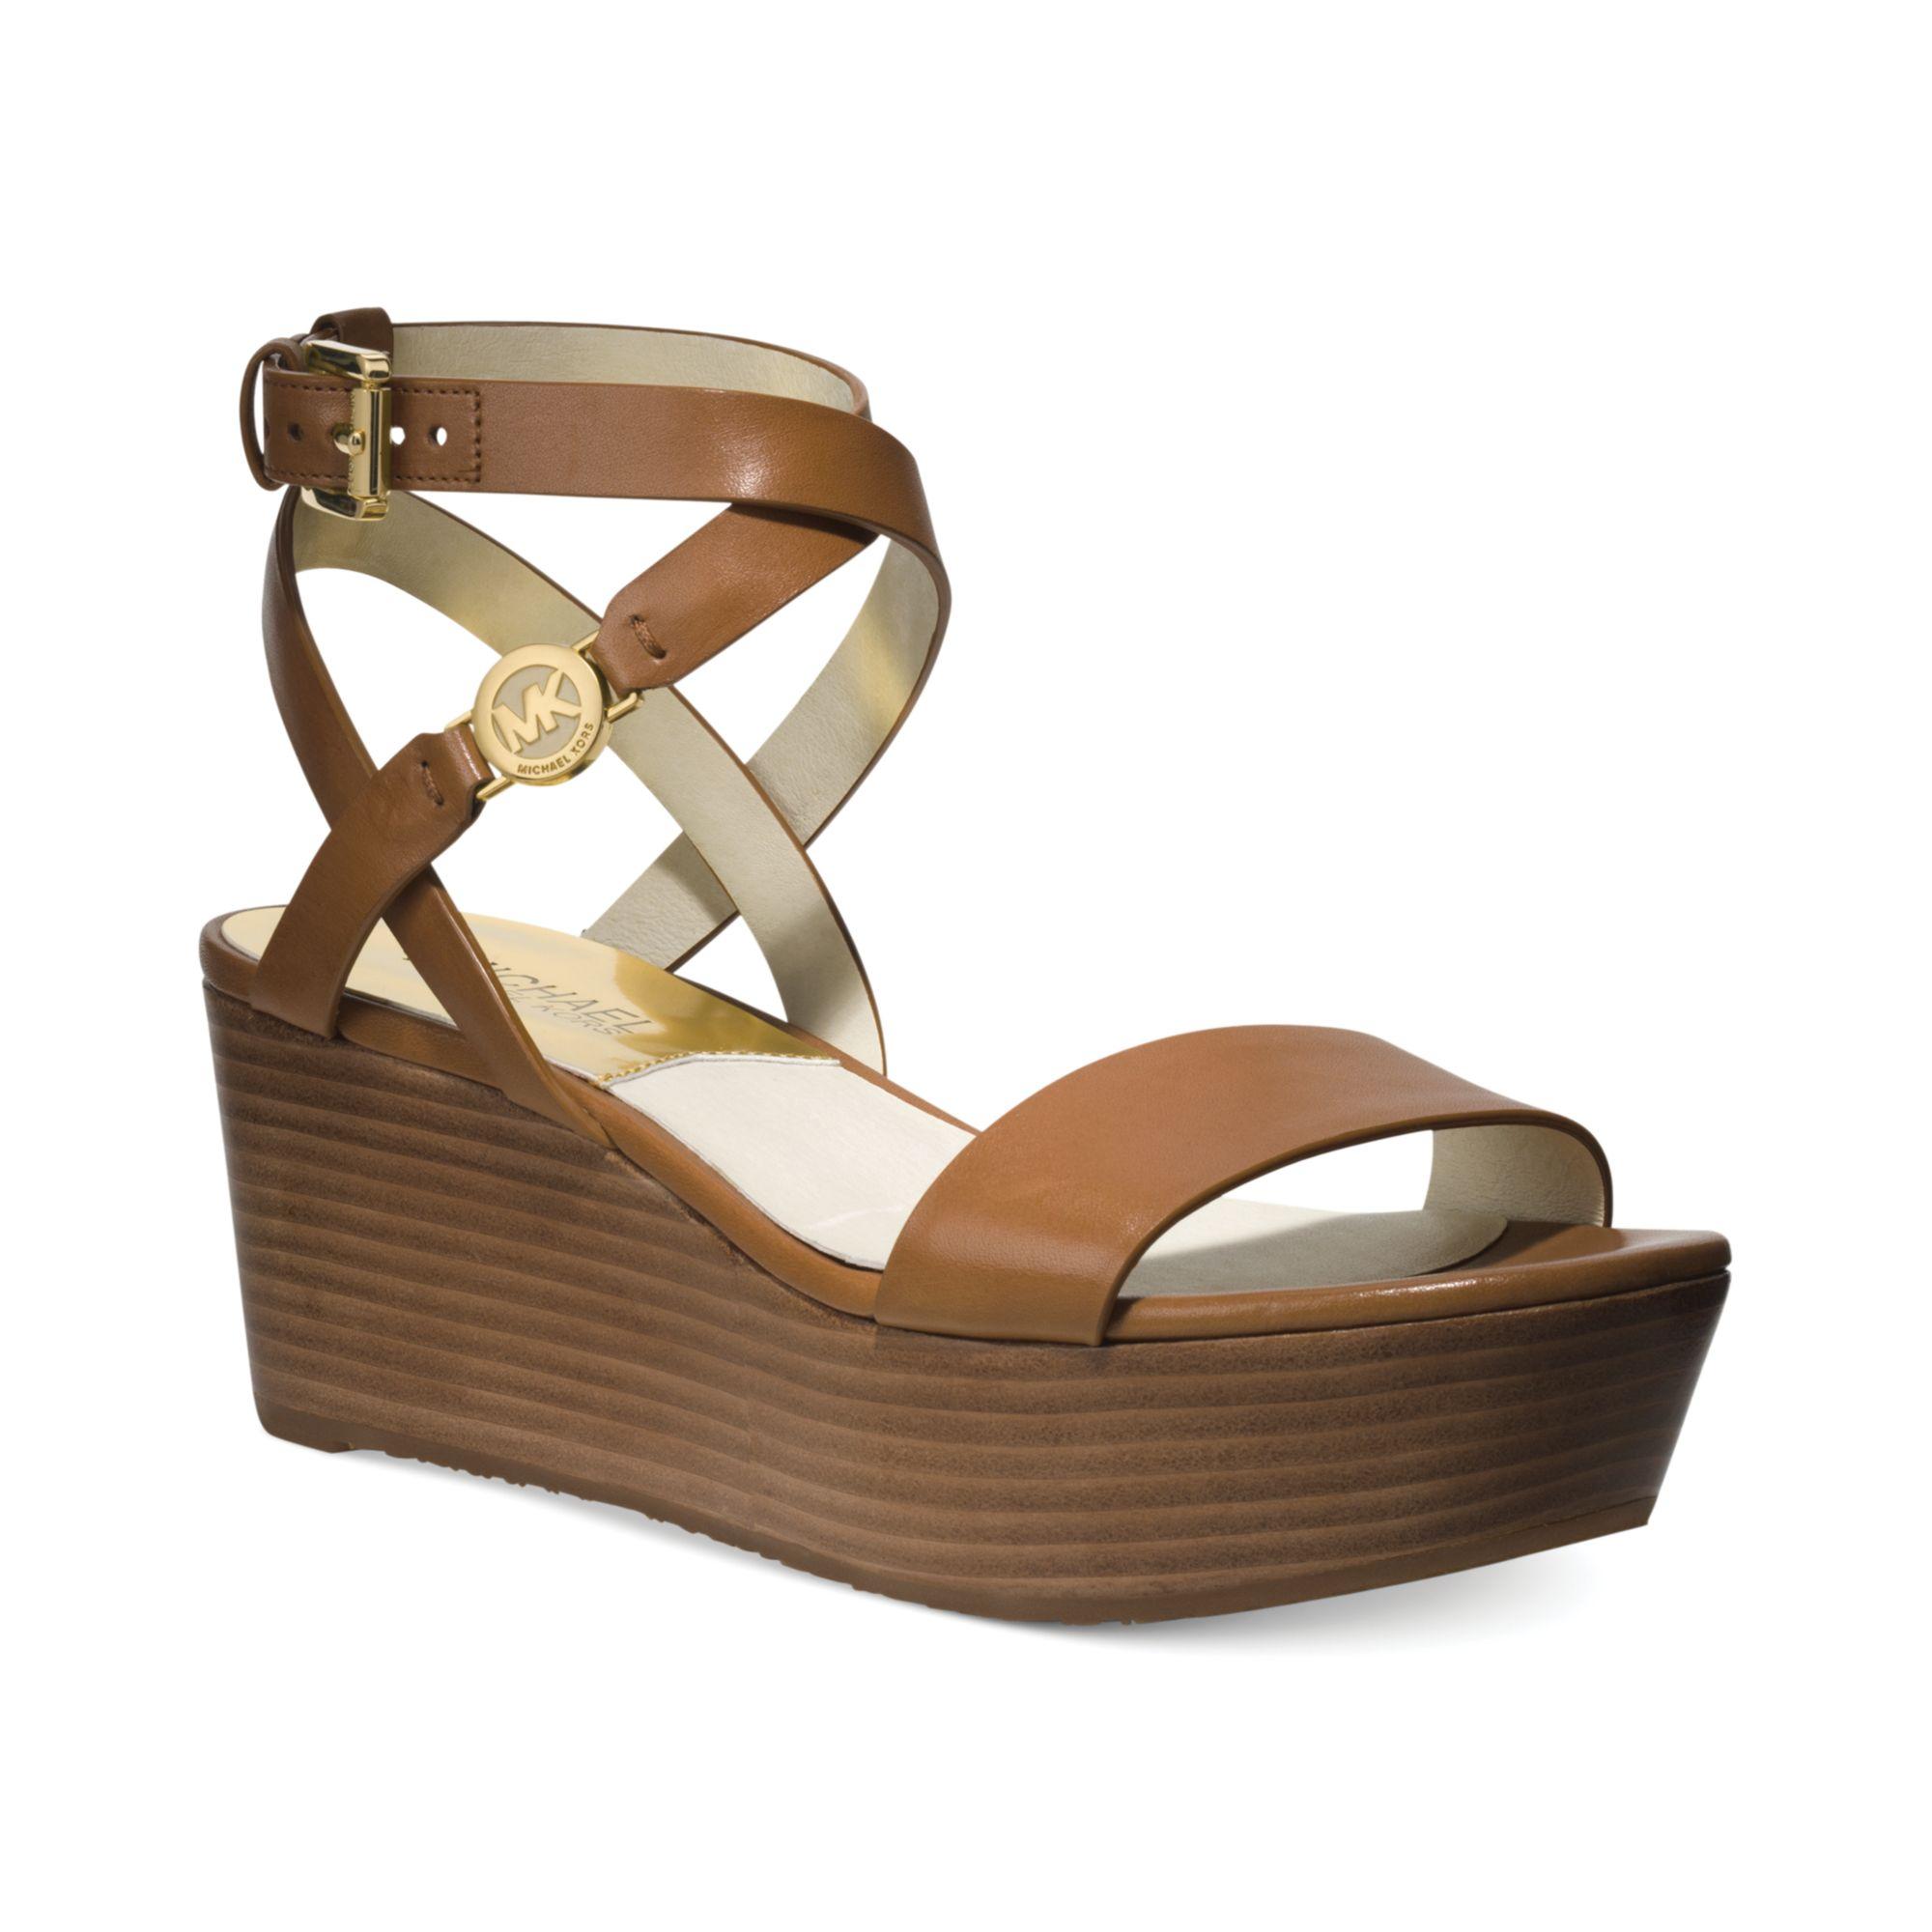 01162e900bd Michael Kors Michael Jalita Charm Platform Wedge Sandals in Brown - Lyst